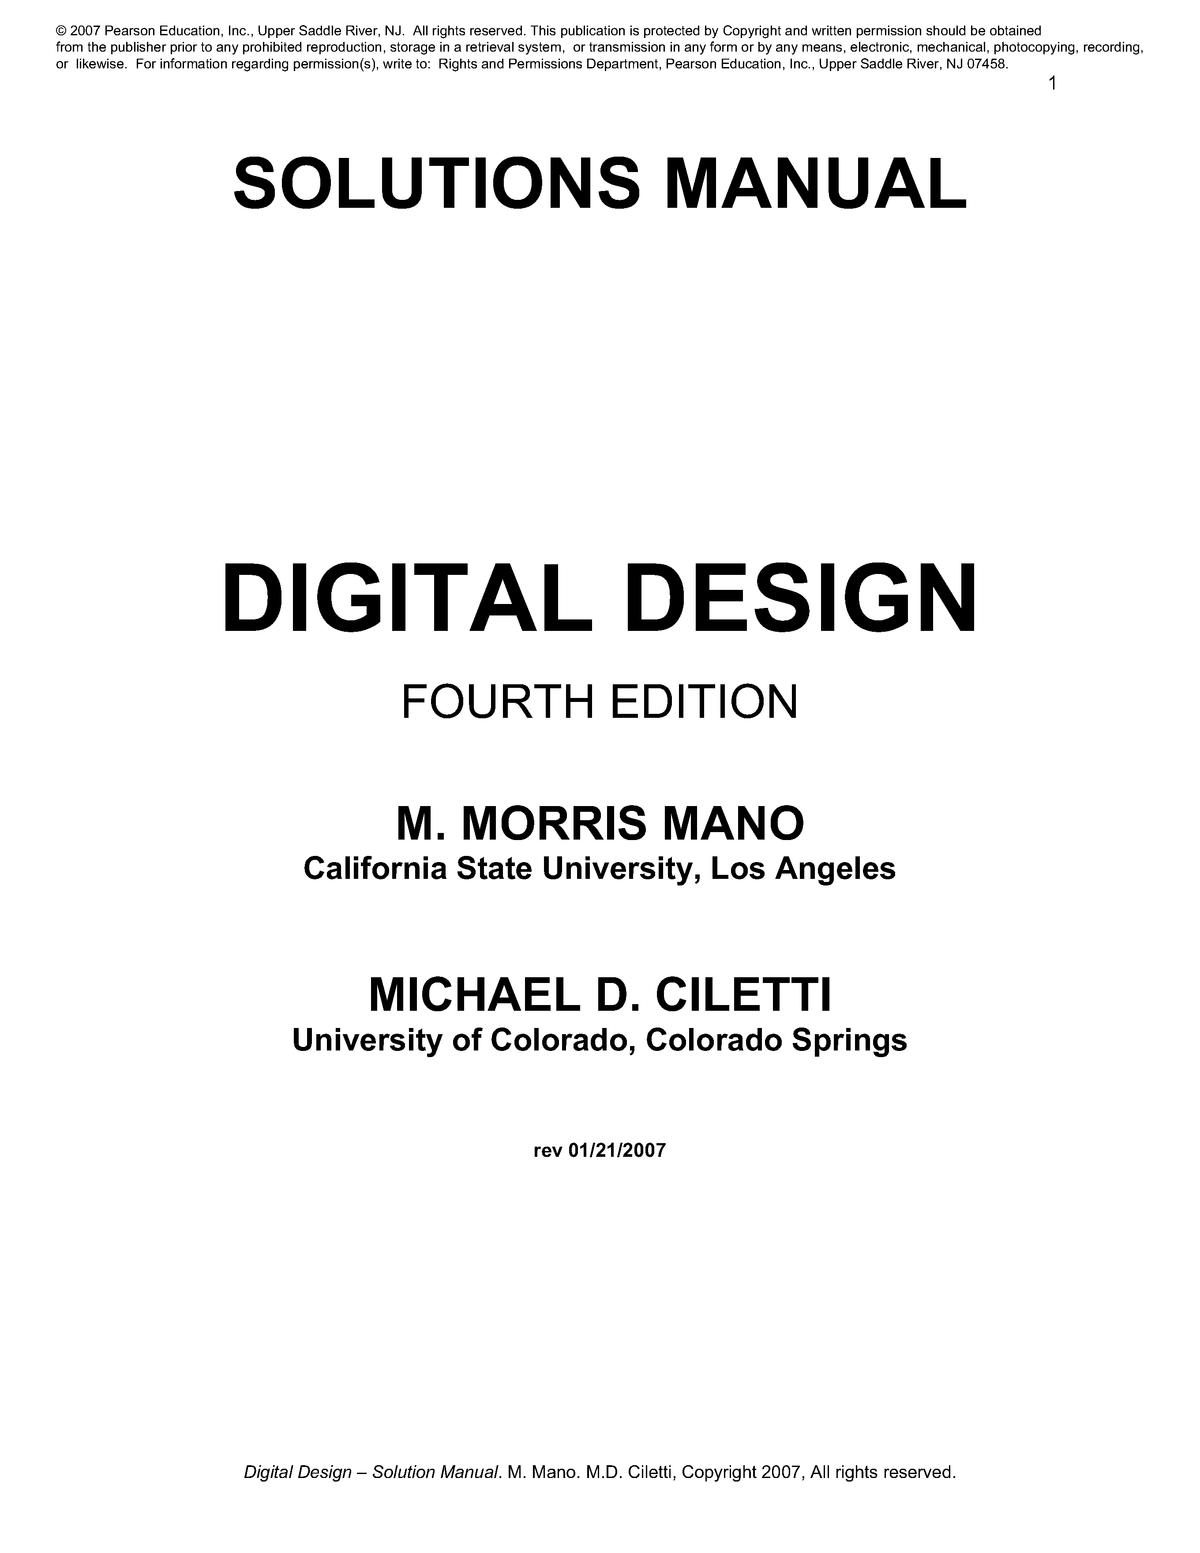 Solution Moris Mano 4th Ed Digital Logic Design Mct 241 Studocu